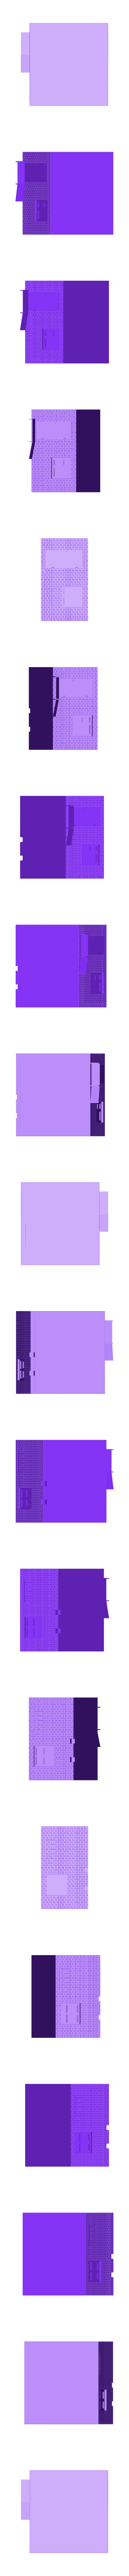 Post-Walls-Simple.stl Download free STL file Railway crossing post building H0 • Design to 3D print, polkin